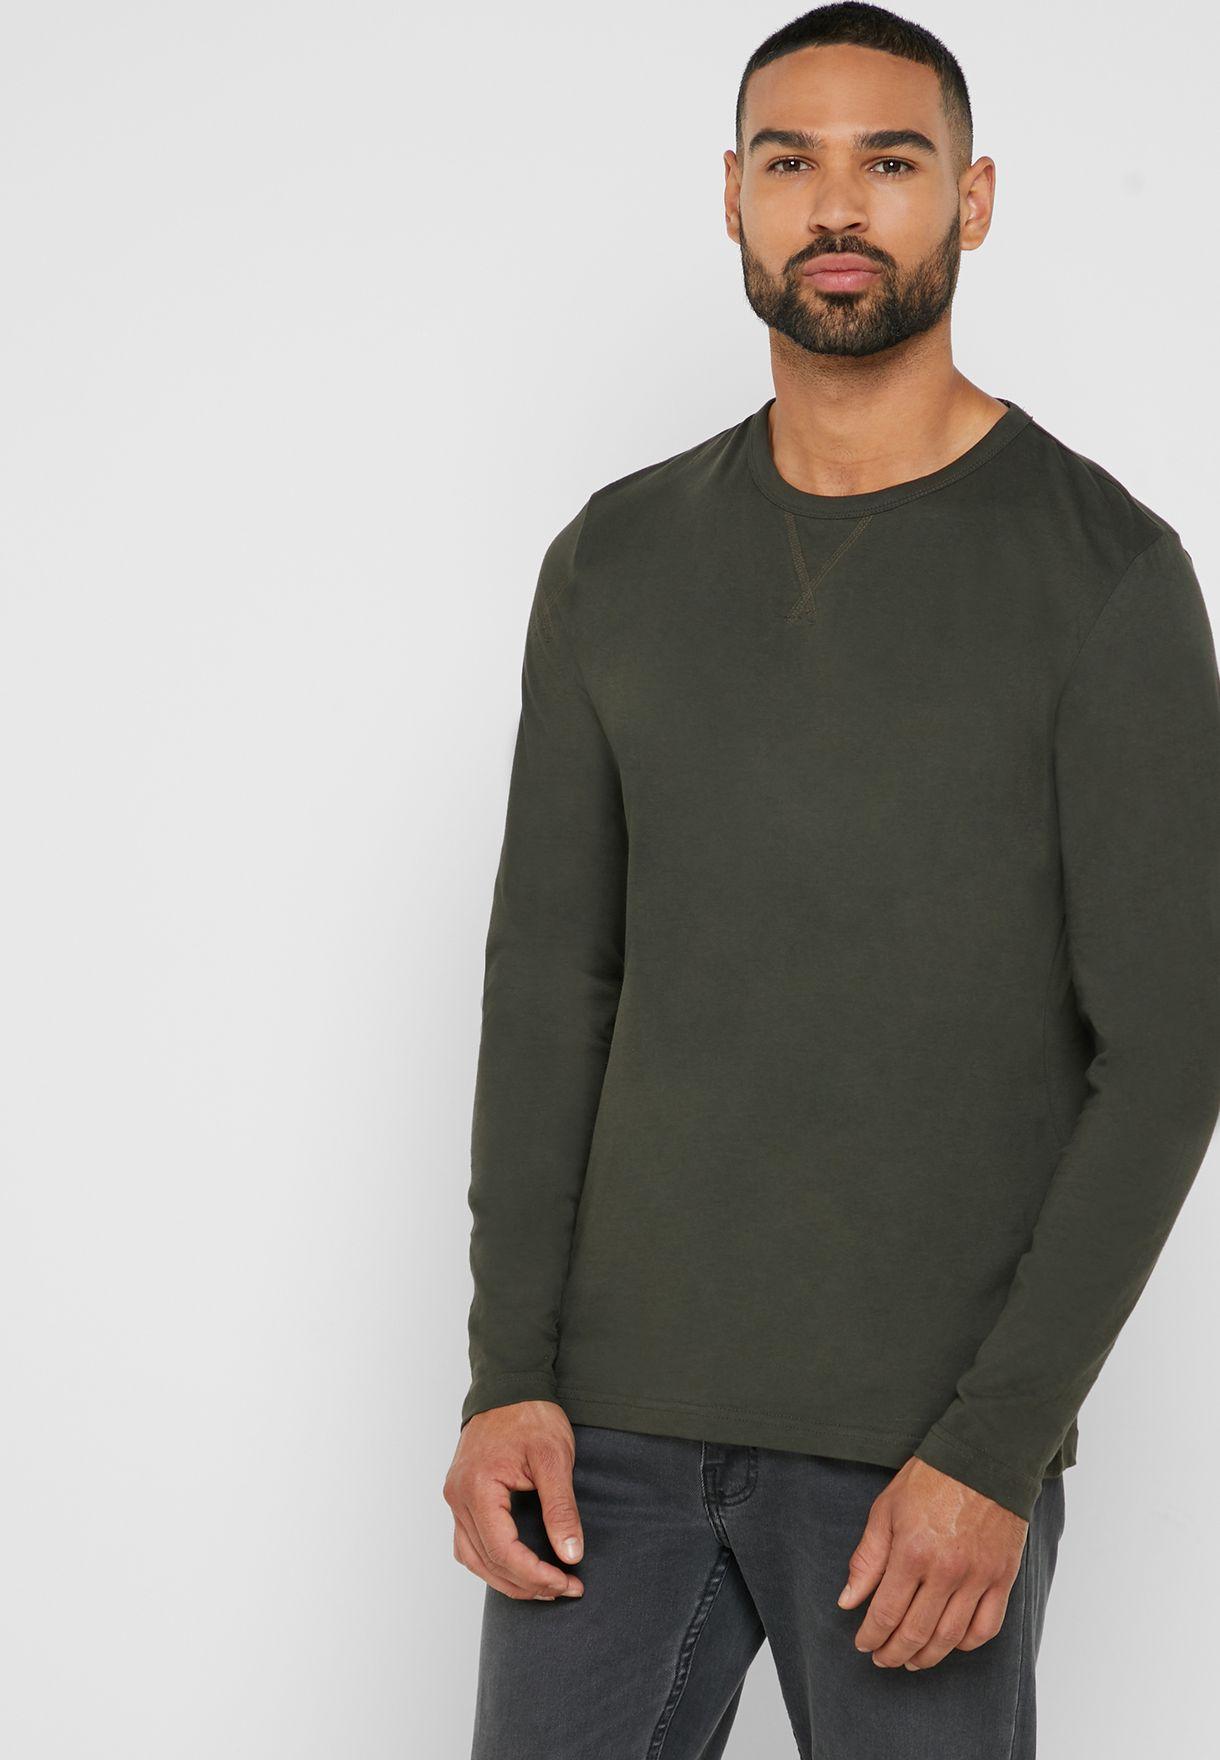 a71a2f7e46 Shop Brave Soul green Long Sleeve T Shirt MLT-69PRAGUEF for Men in ...